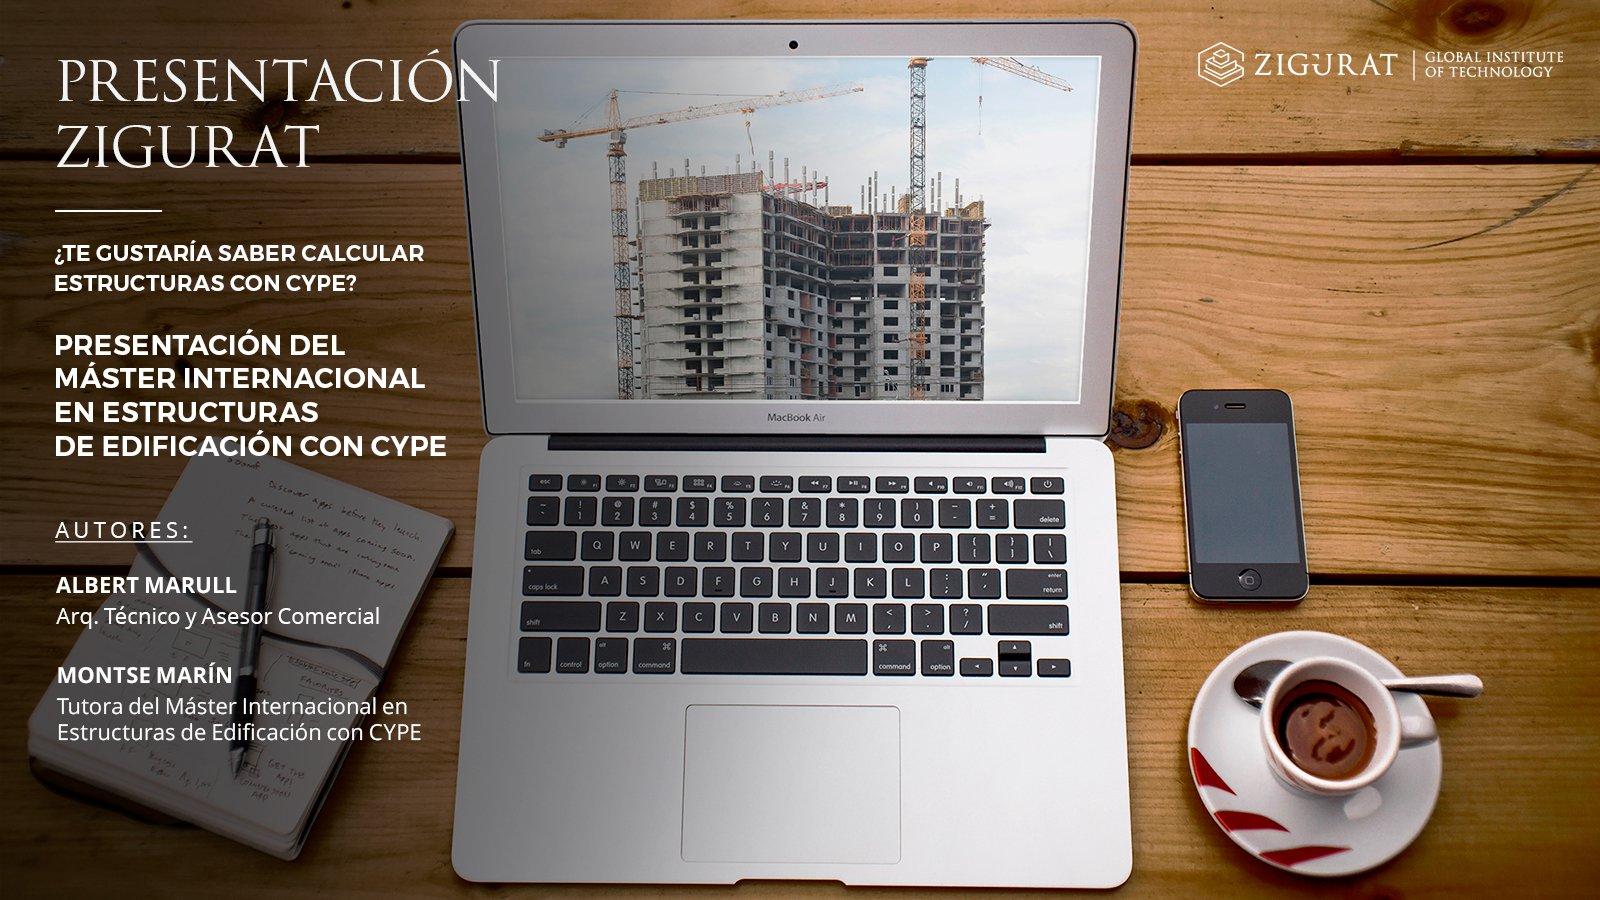 presentacion-estructuras-presentacion-mee-master-zigurat-02